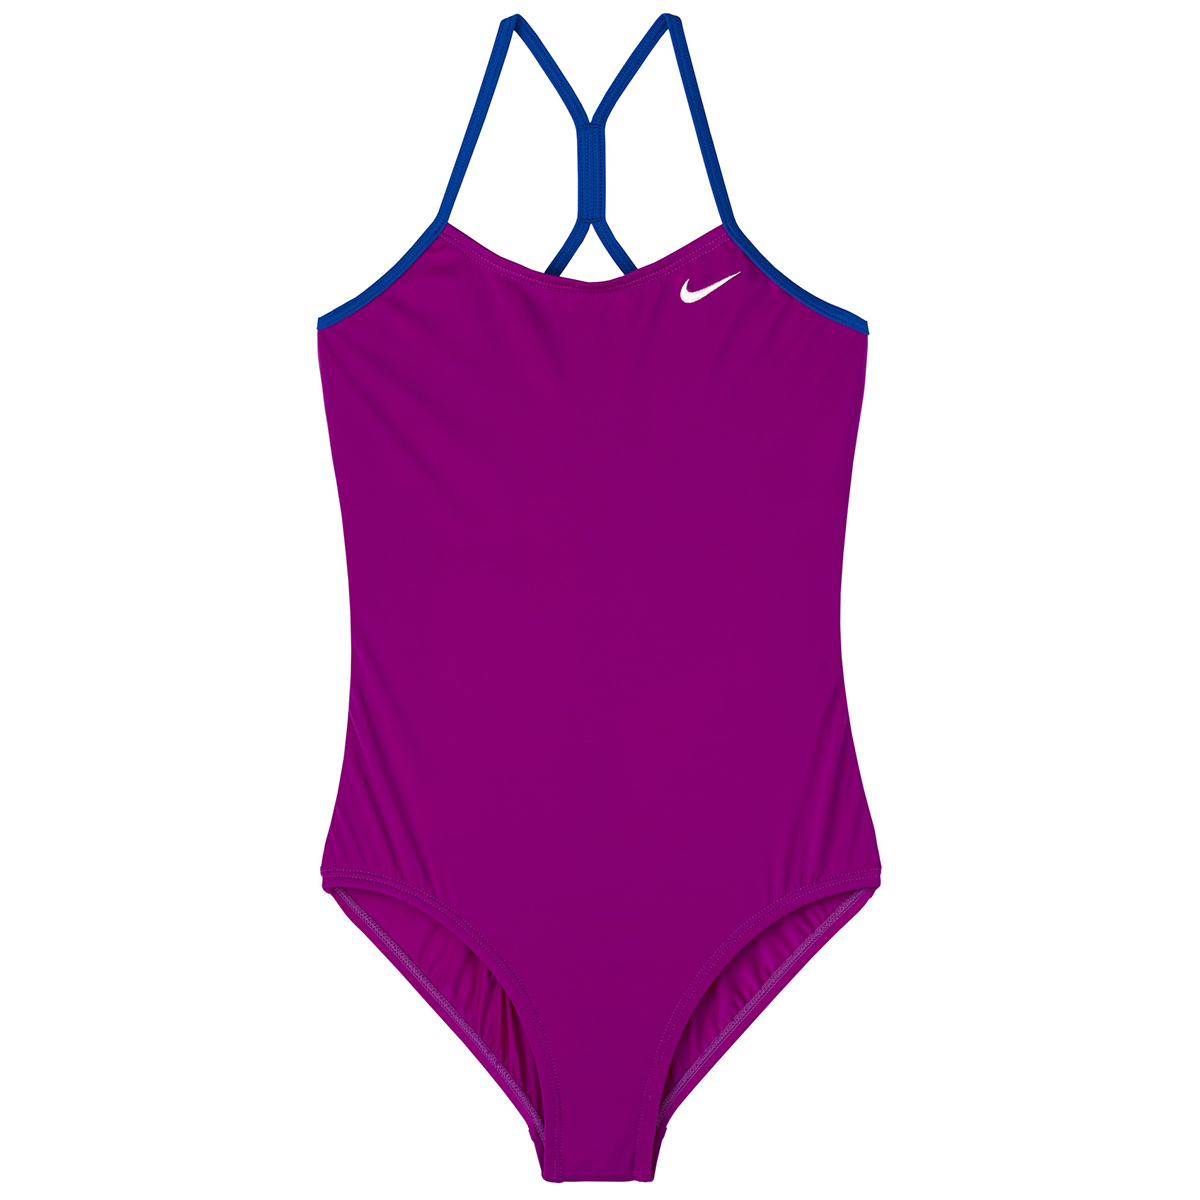 Nike Big Girls' Solid Racerback One-Piece Swimsuit - Purple, S